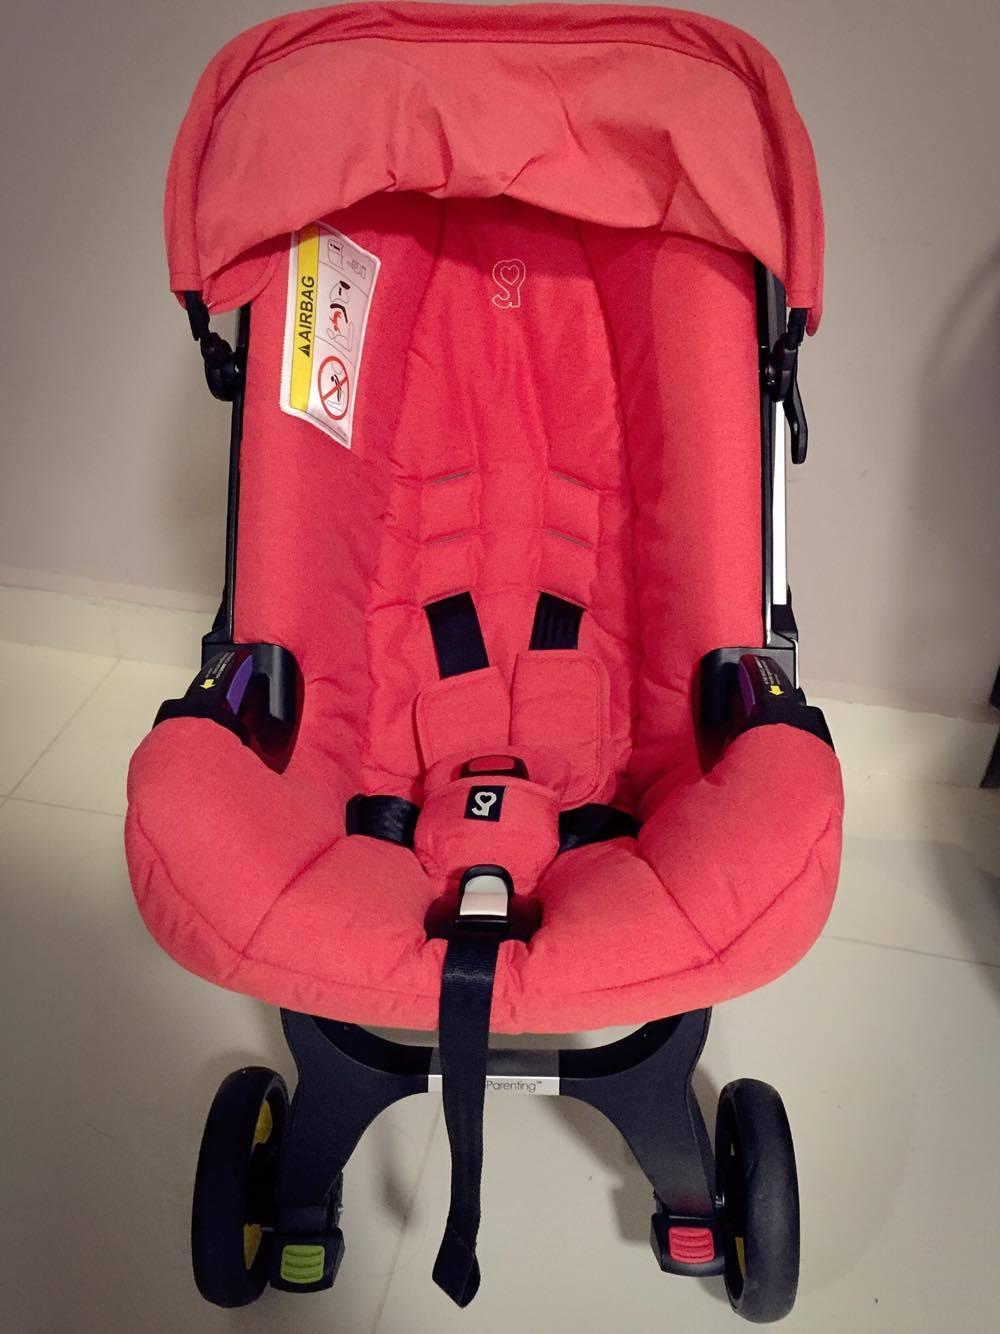 Doona Car Seat Amazon